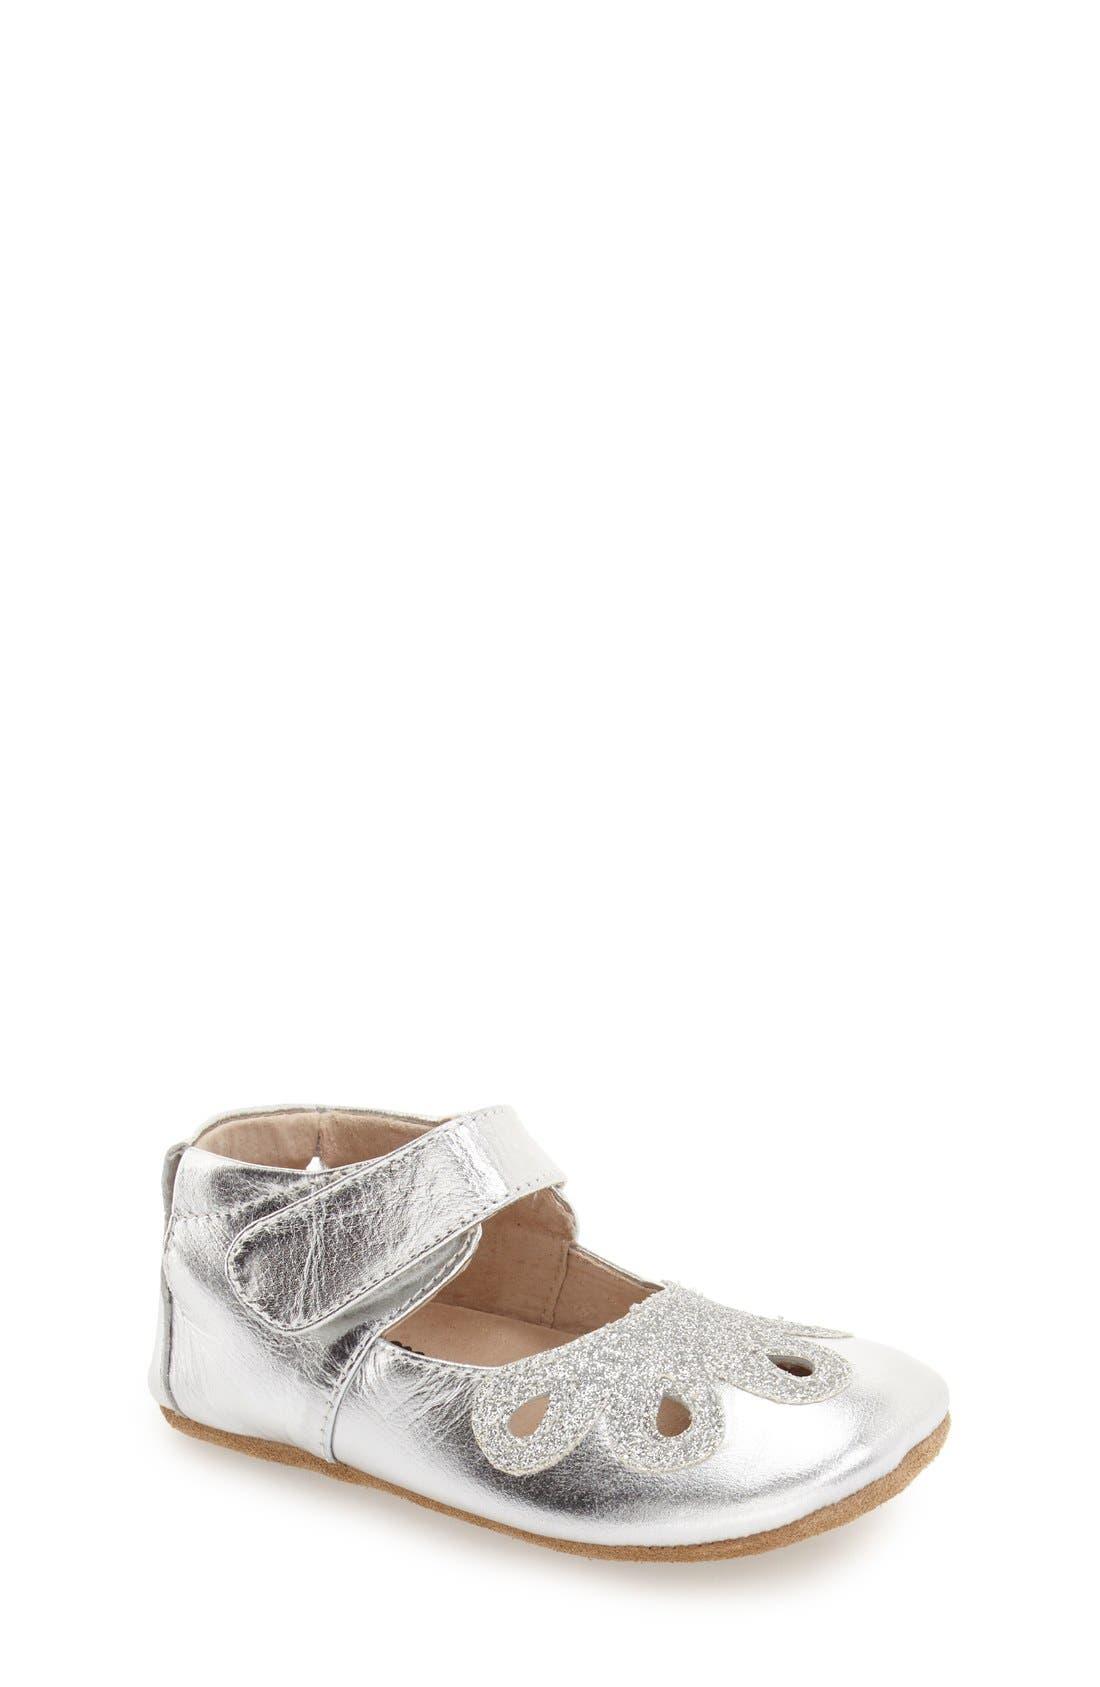 'Petal' Mary Jane Crib Shoe,                         Main,                         color, 040